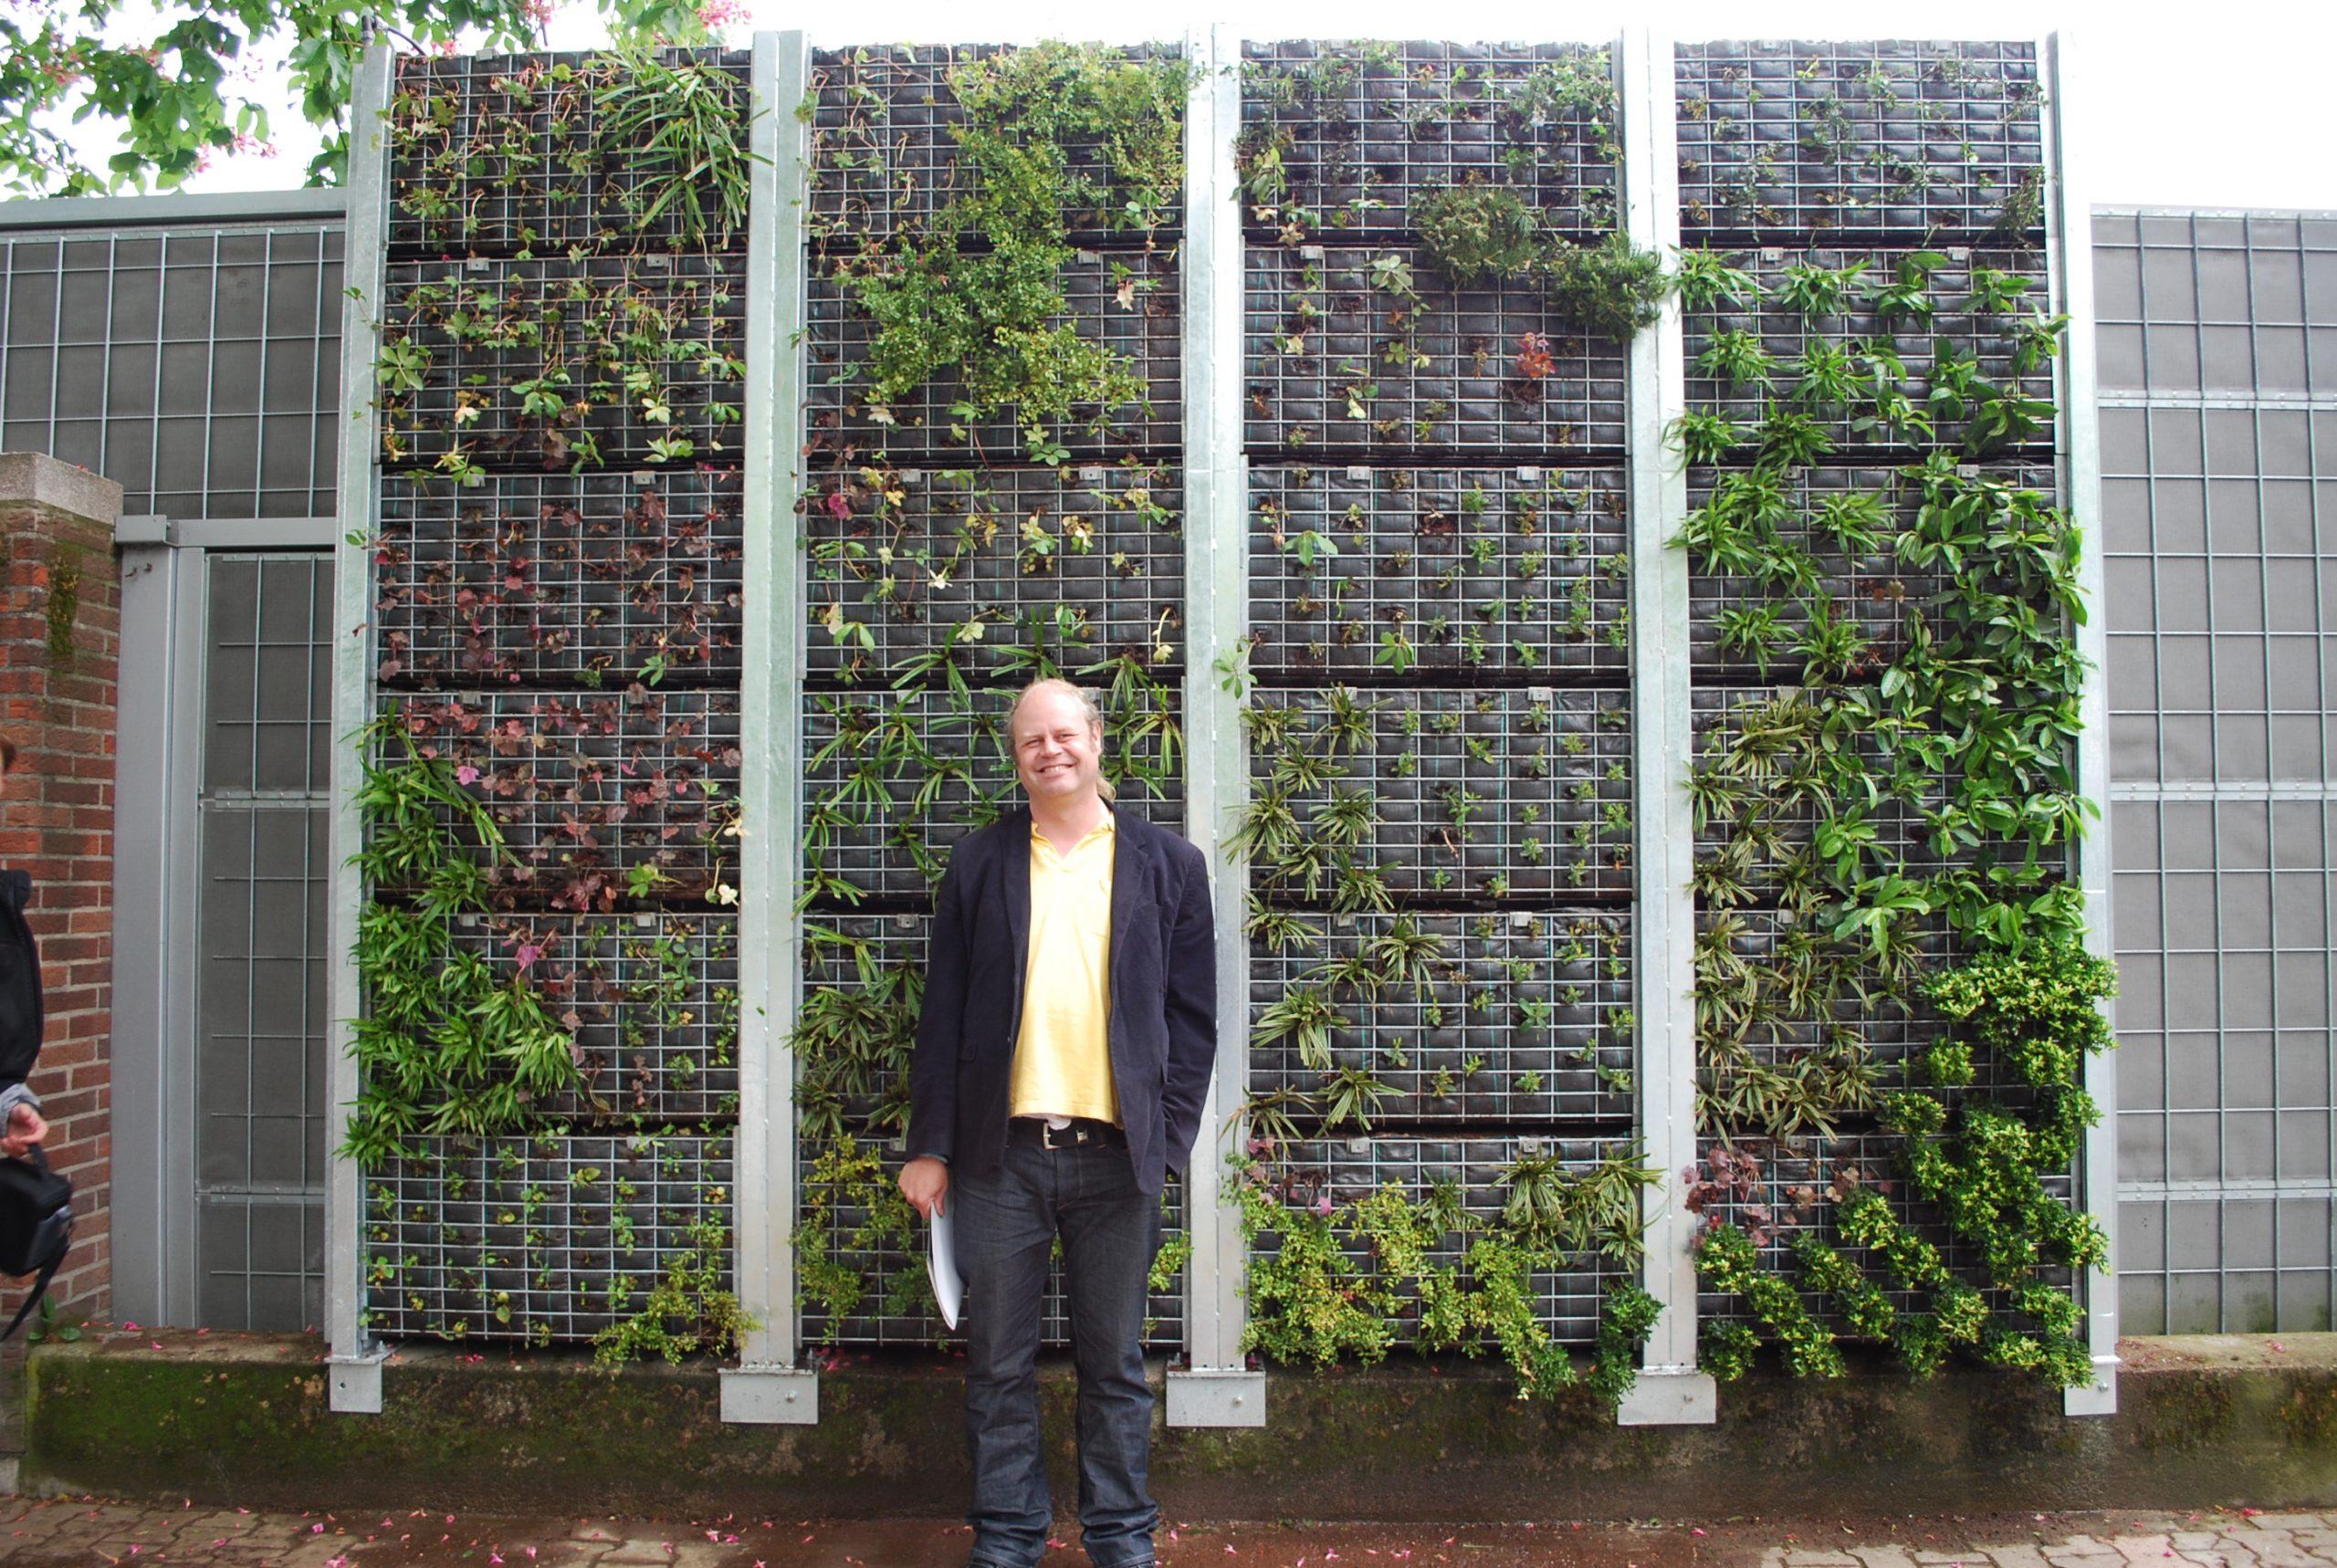 Full Size of Vertikal Garten Vertical Garden Indoor Plants Gardening In India Pdf Images Watering Aussen Plans Machbarkeitsstuvertikaler Bundesverband Gebudegrn Relaxsessel Garten Vertikal Garten